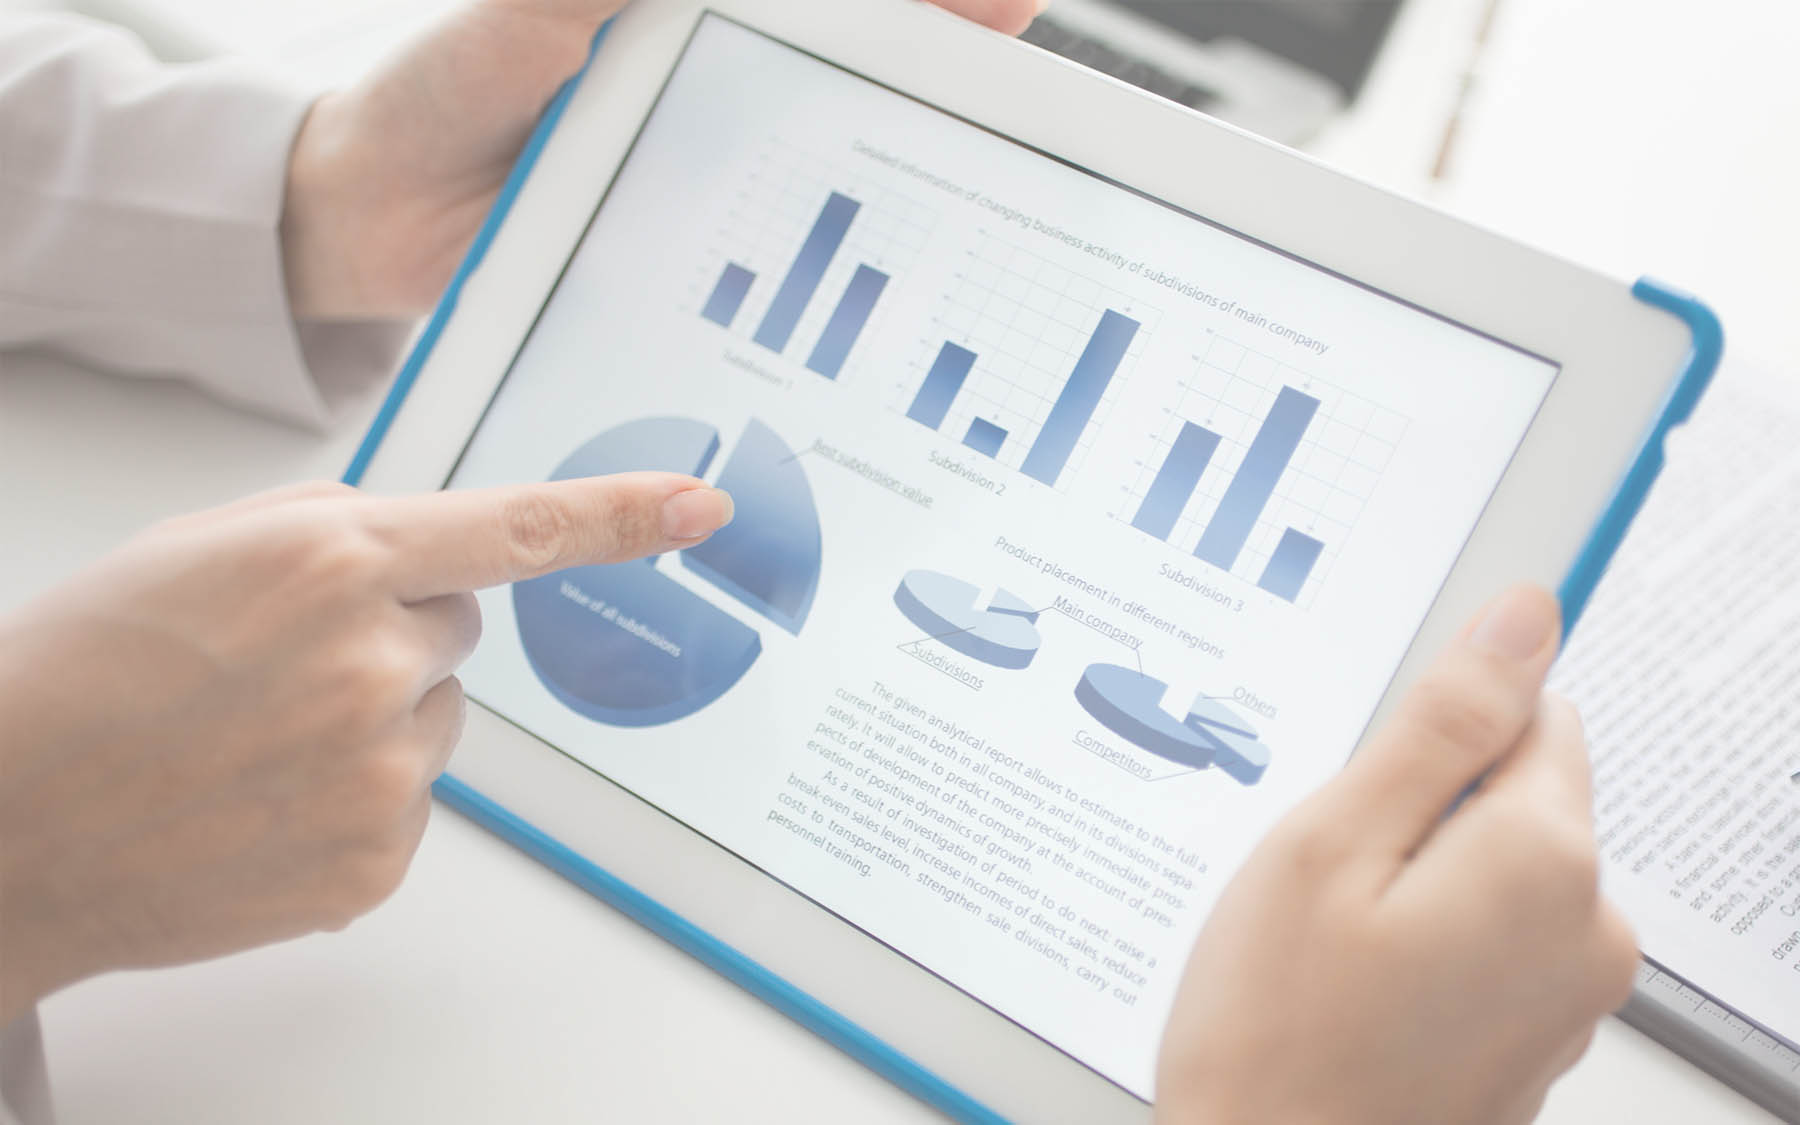 seniorvisualbi business intelligence system reports